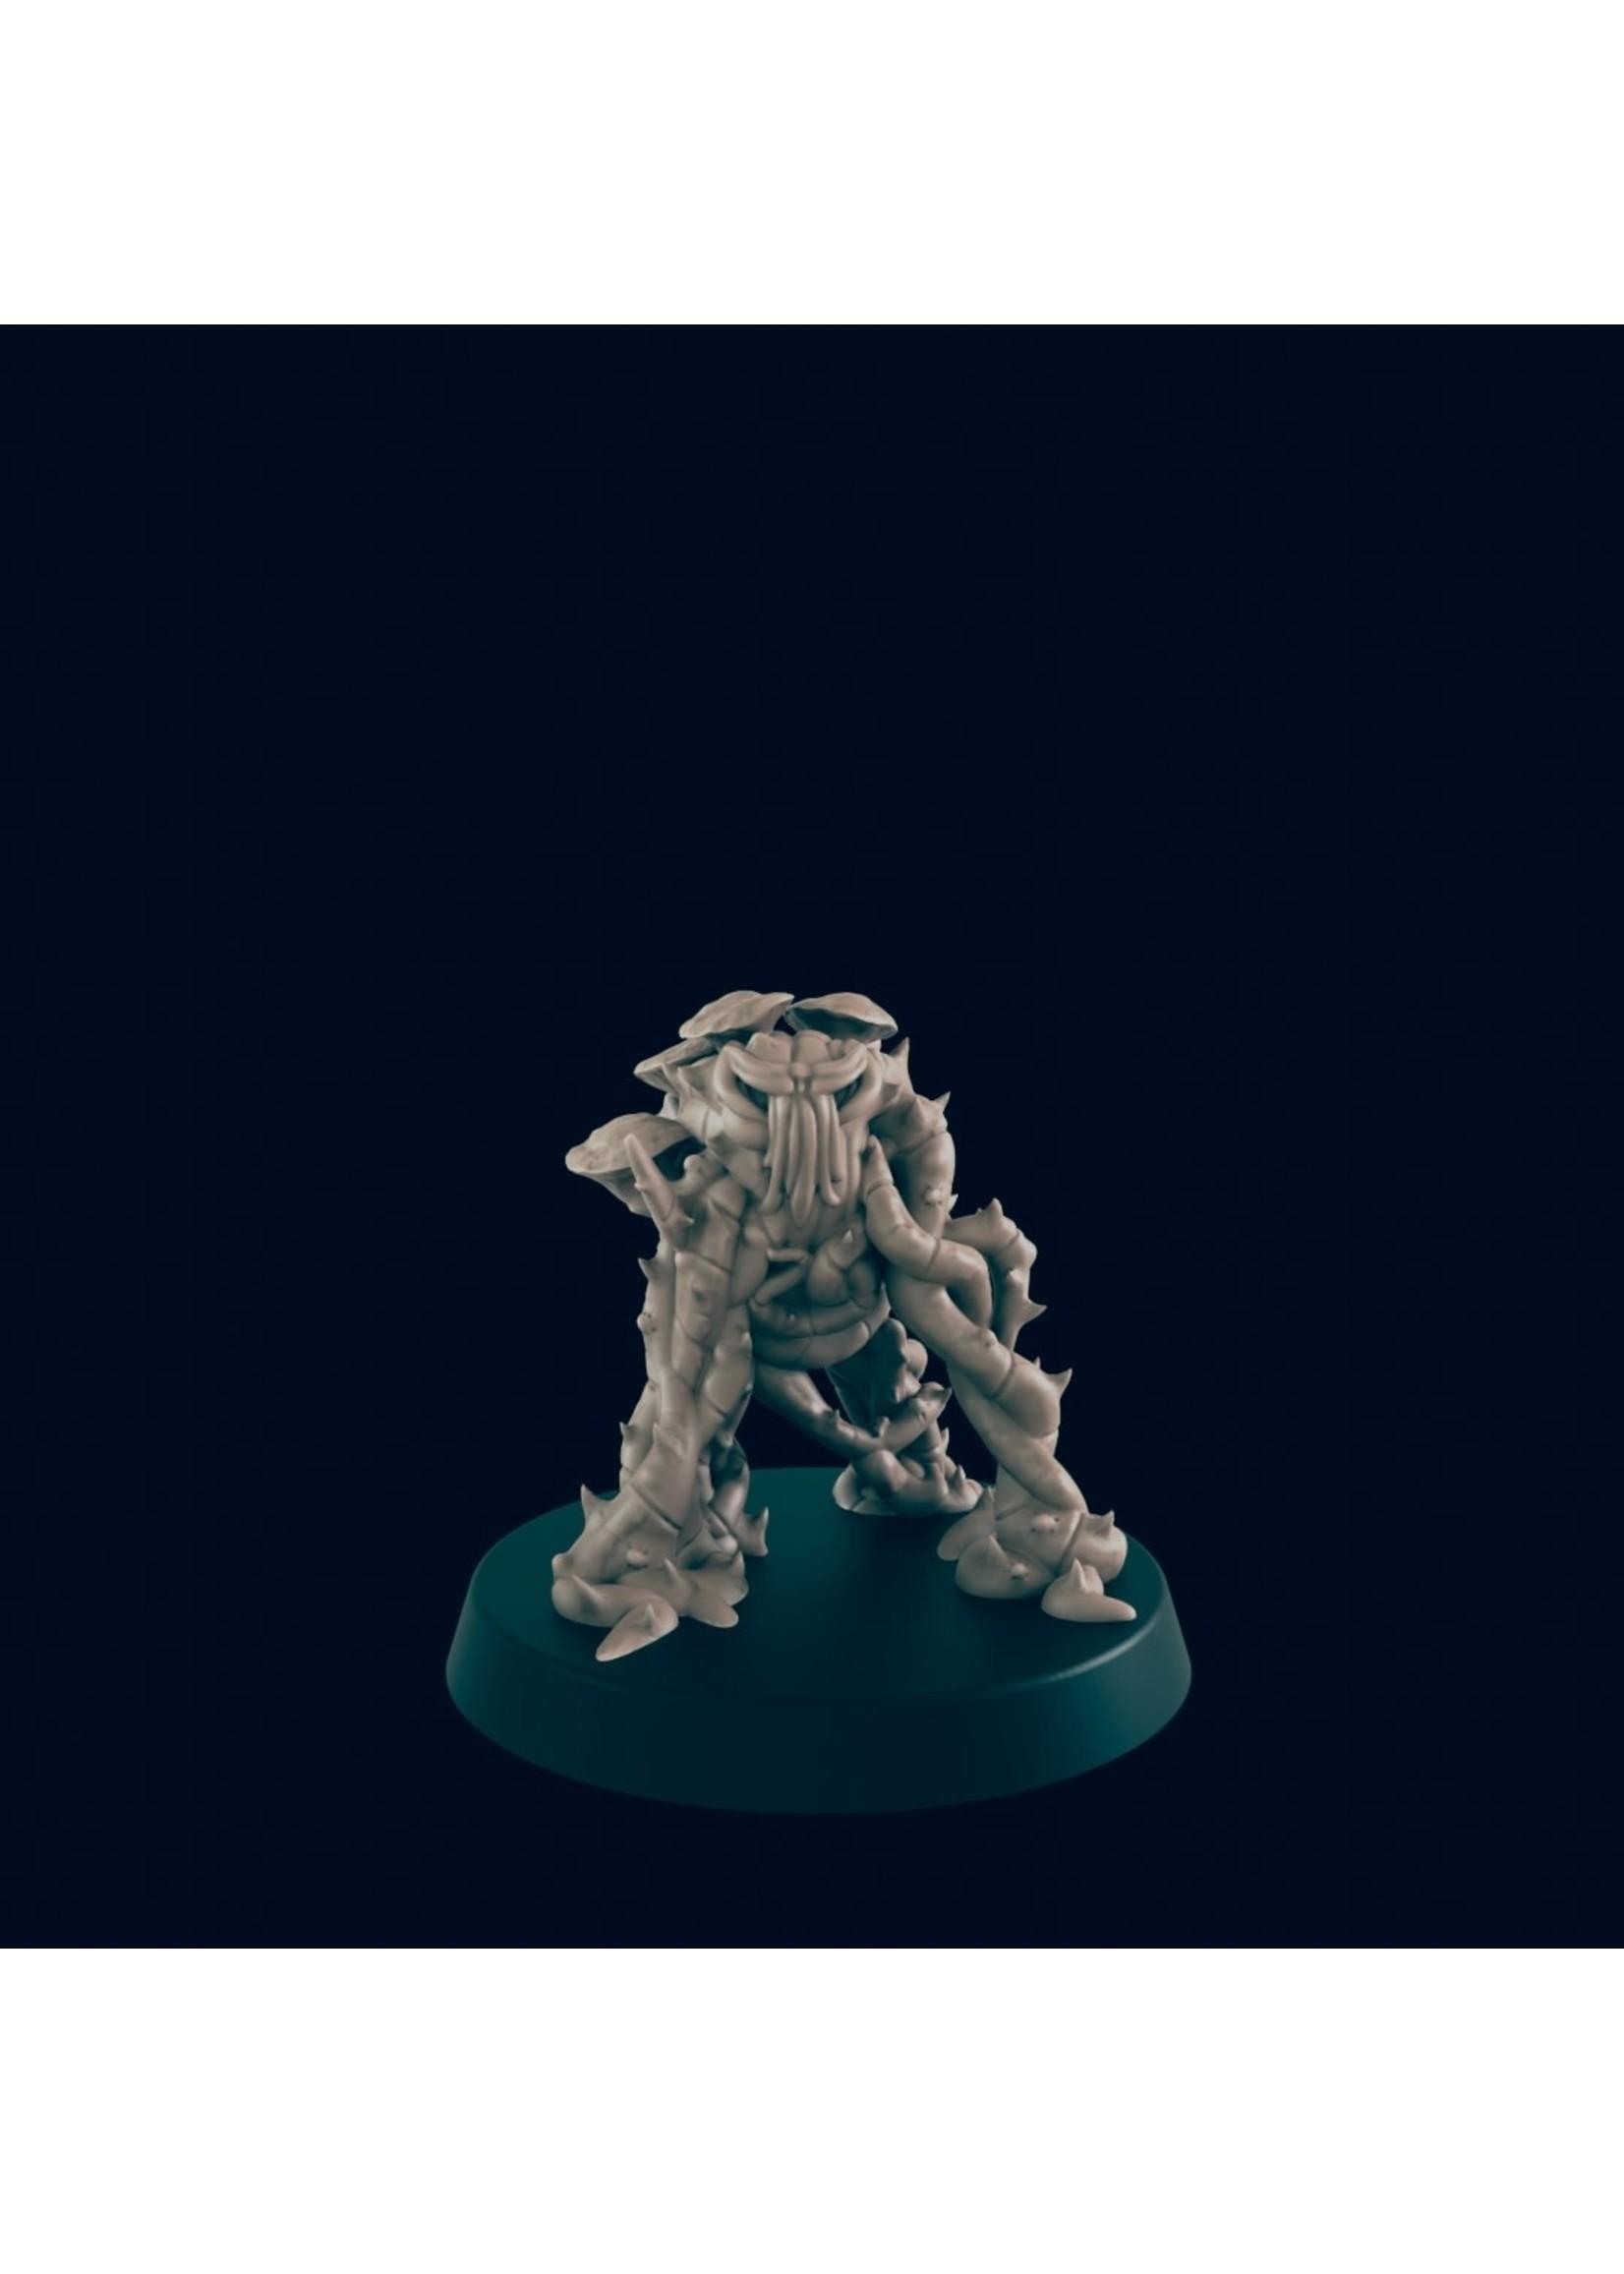 3D Printed Miniature - Vine Blight - Dungeons & Dragons - Beasts and Baddies KS